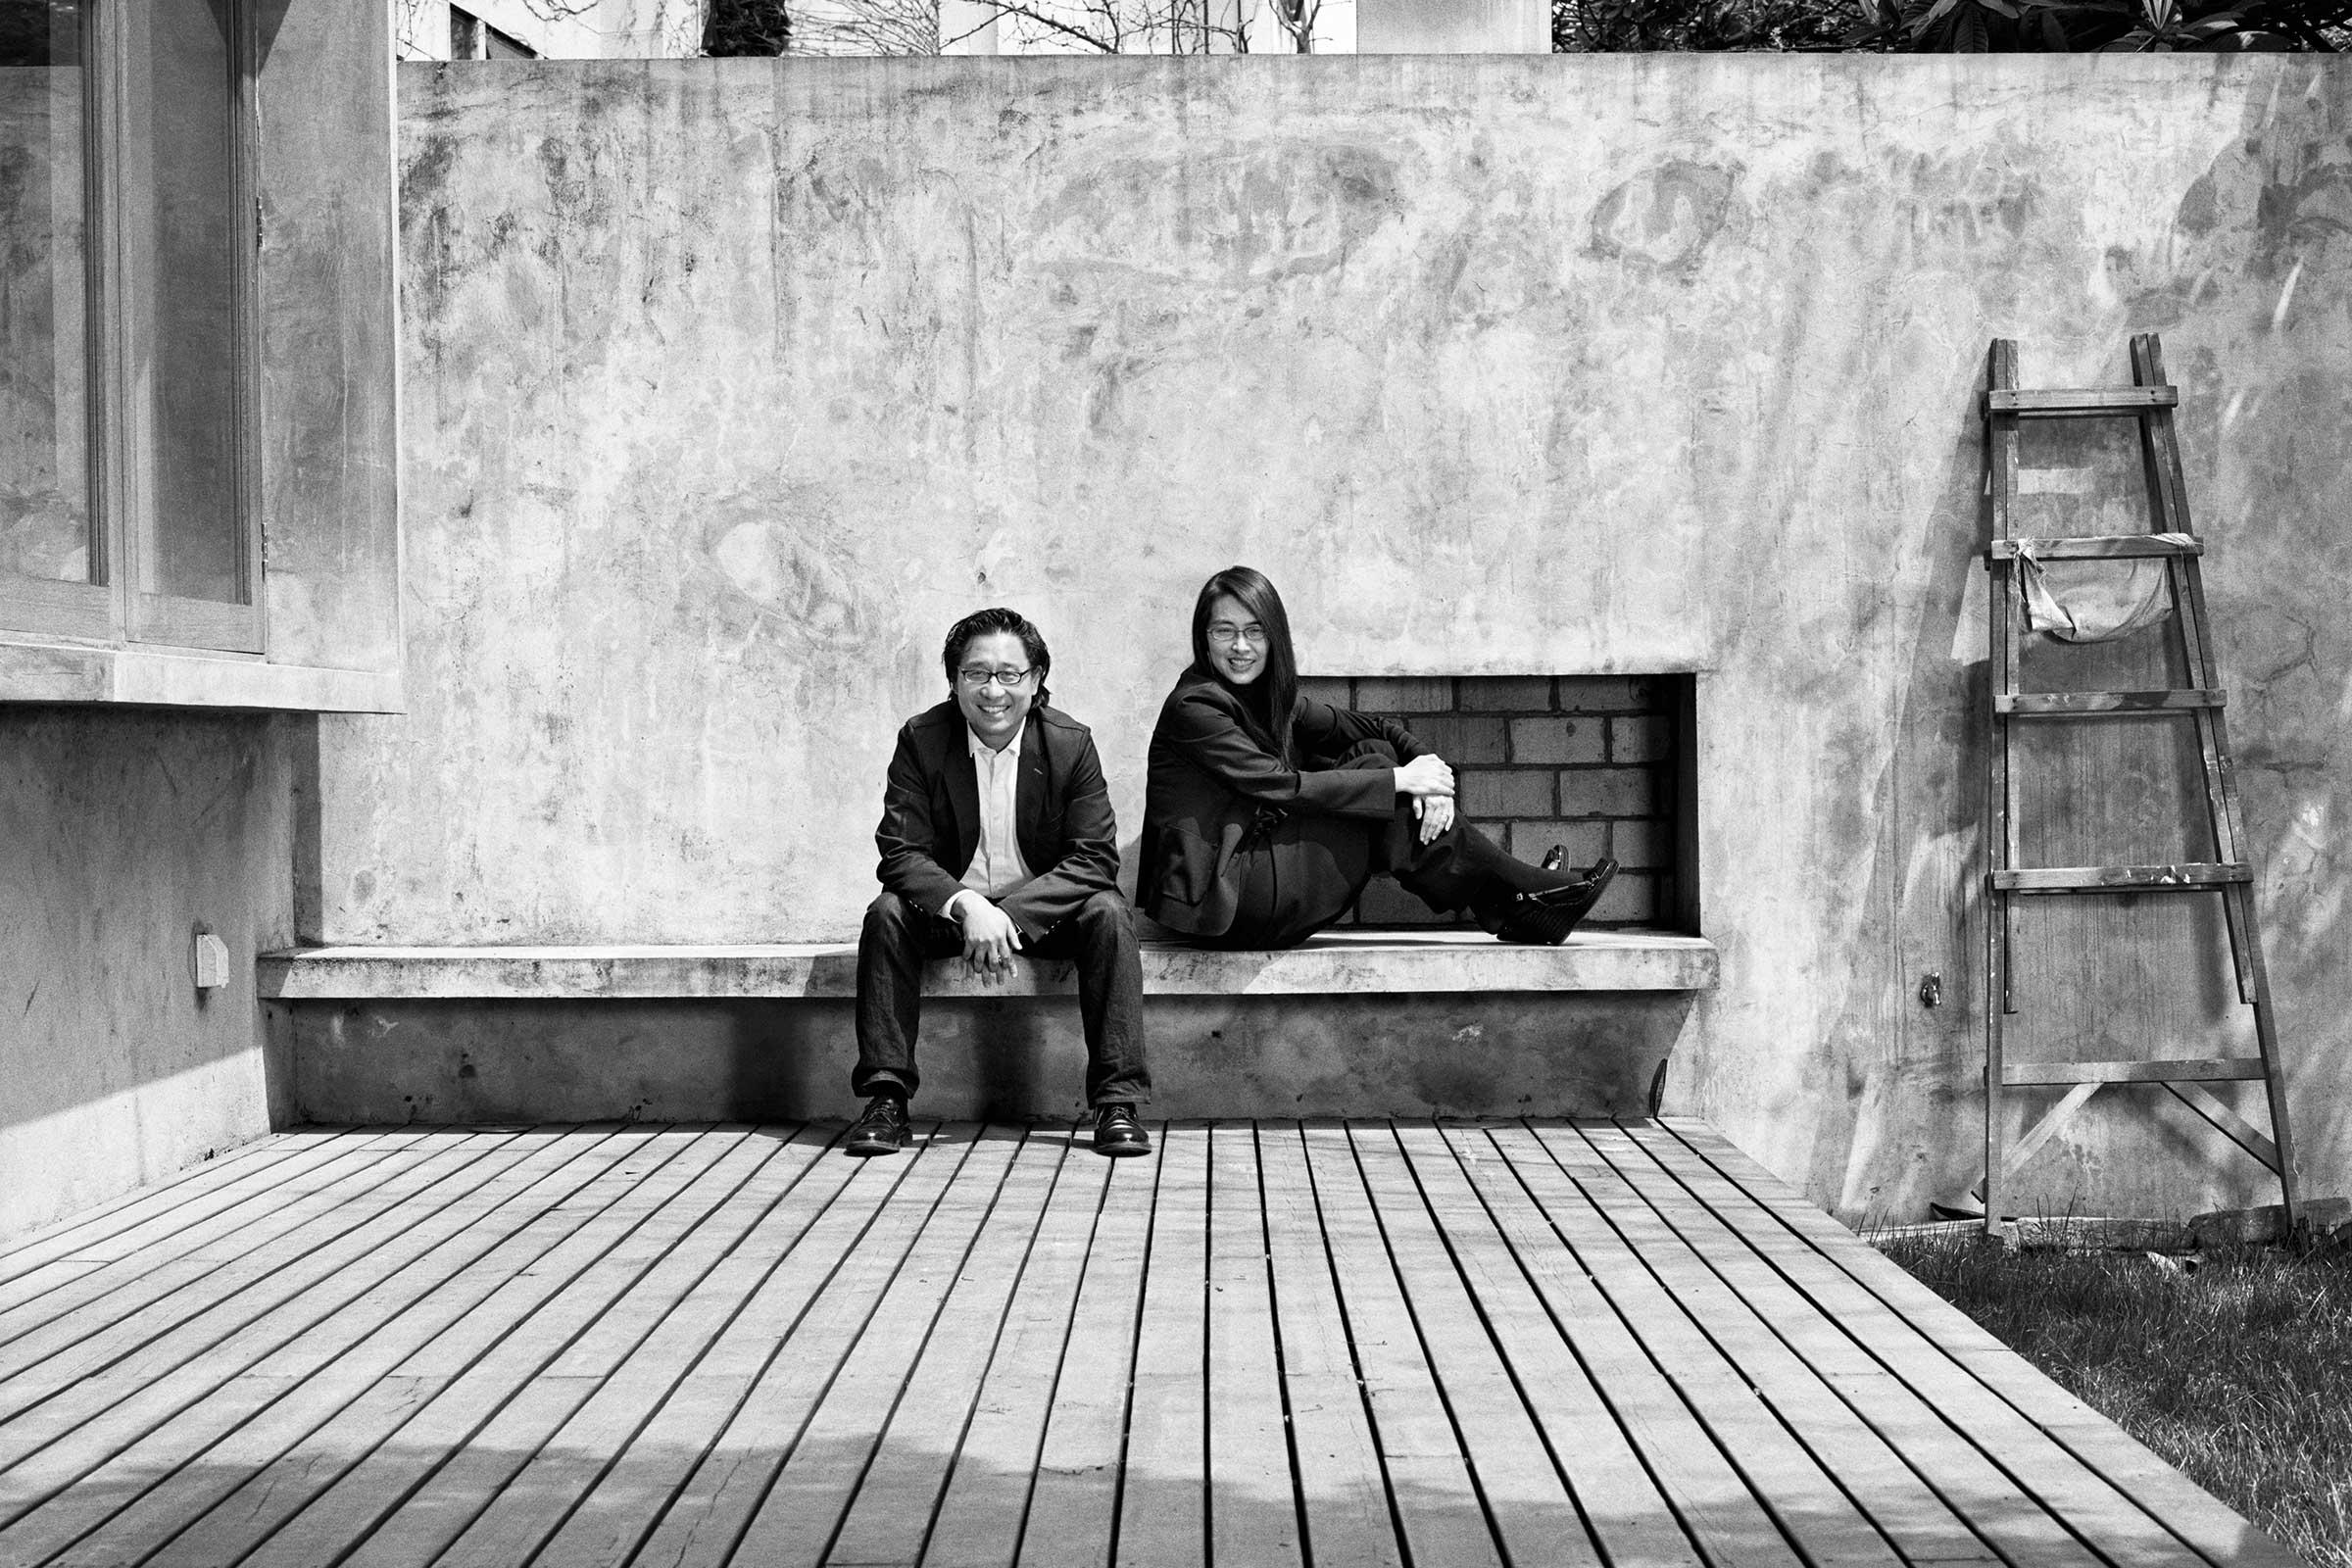 Lyndon Neri and Rossana Hu. Image by Andrew Rowat